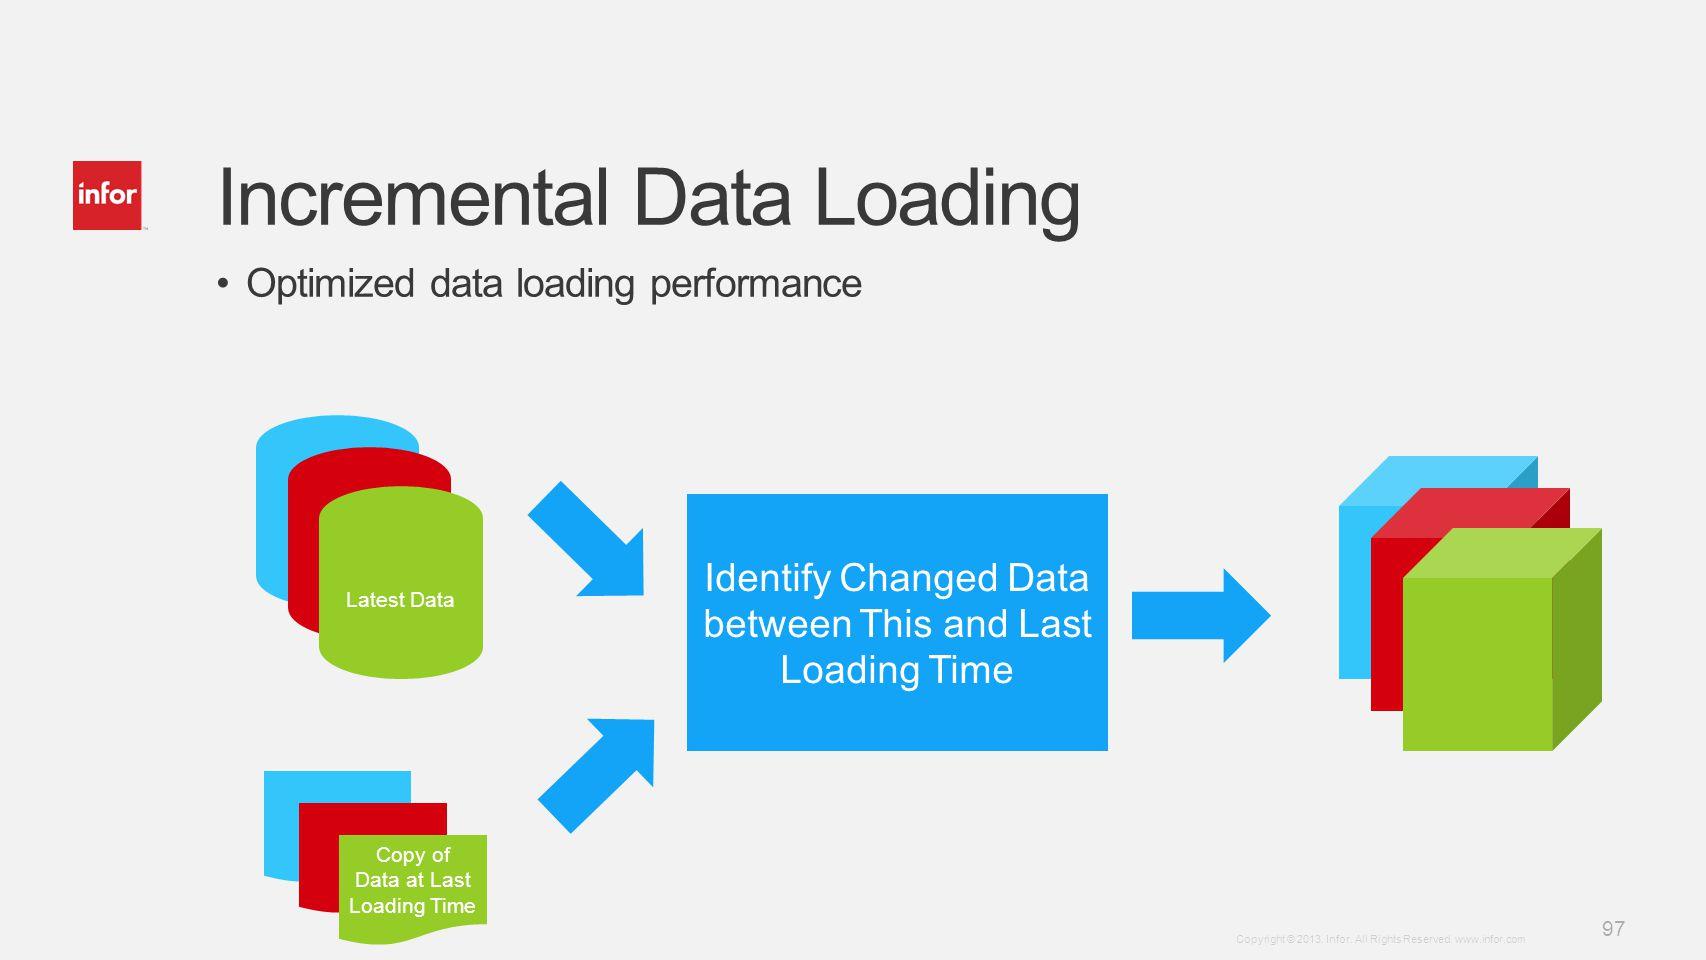 Incremental Data Loading